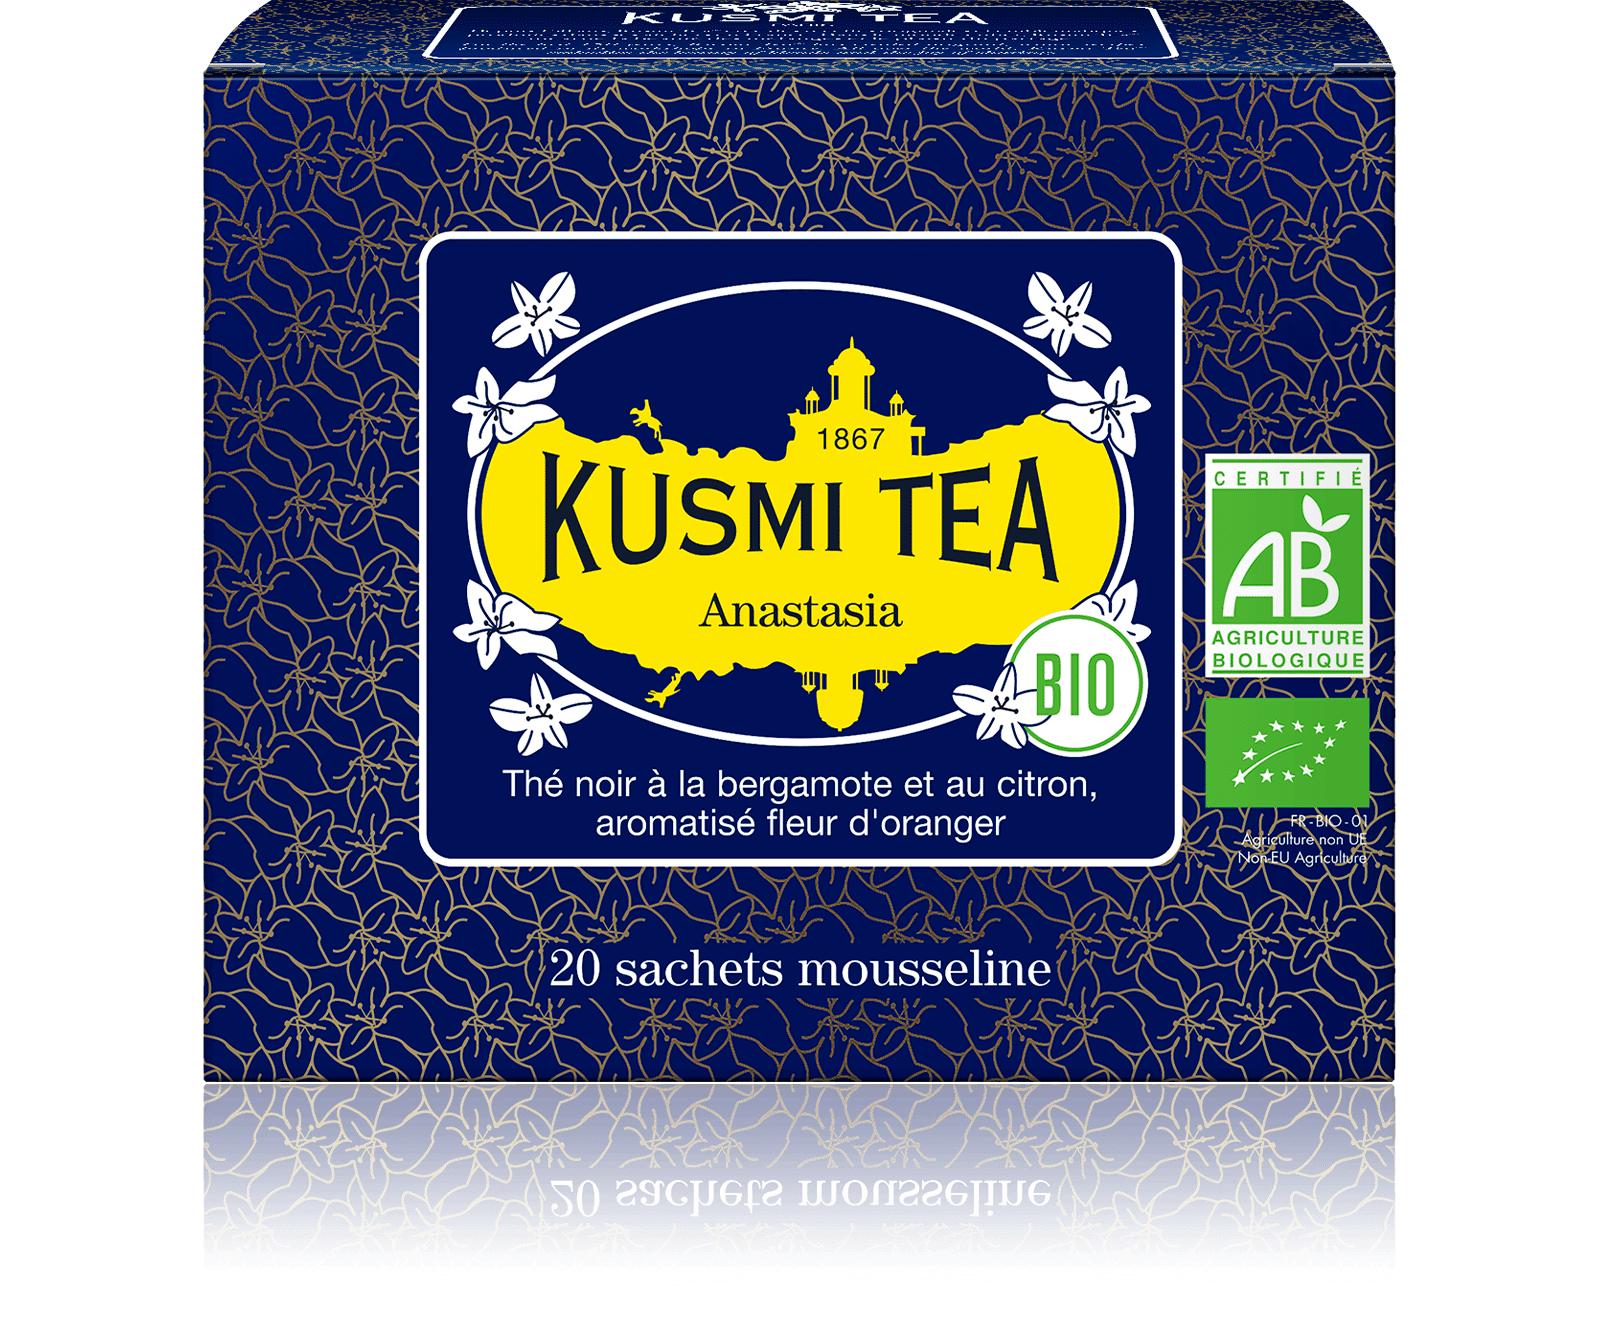 KUSMI TEA Anastasia bio - Thé noir earl grey, citron - Sachets de thé - Kusmi Tea